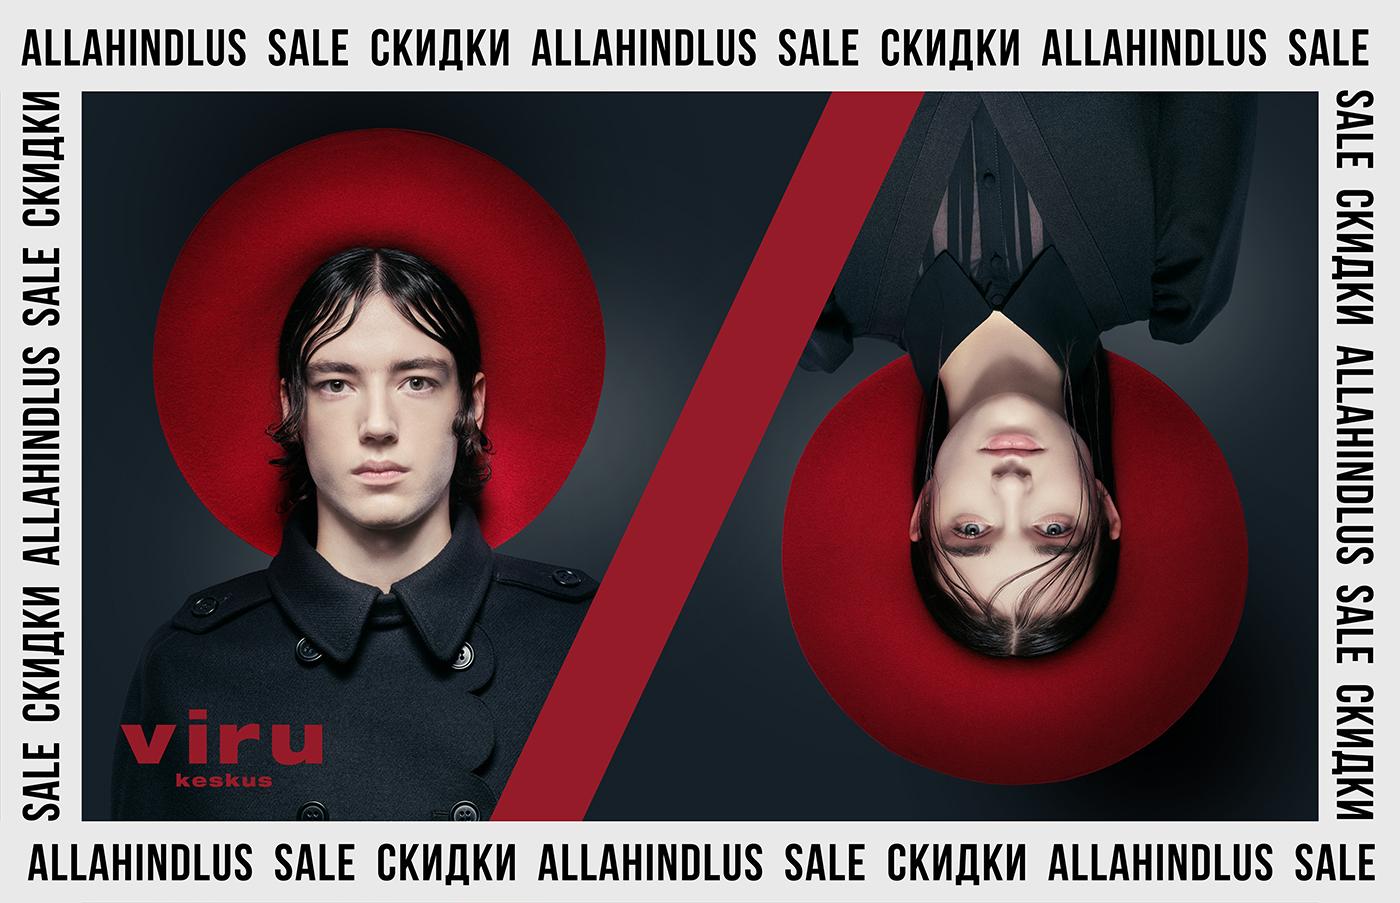 Viru Keskus Campaign